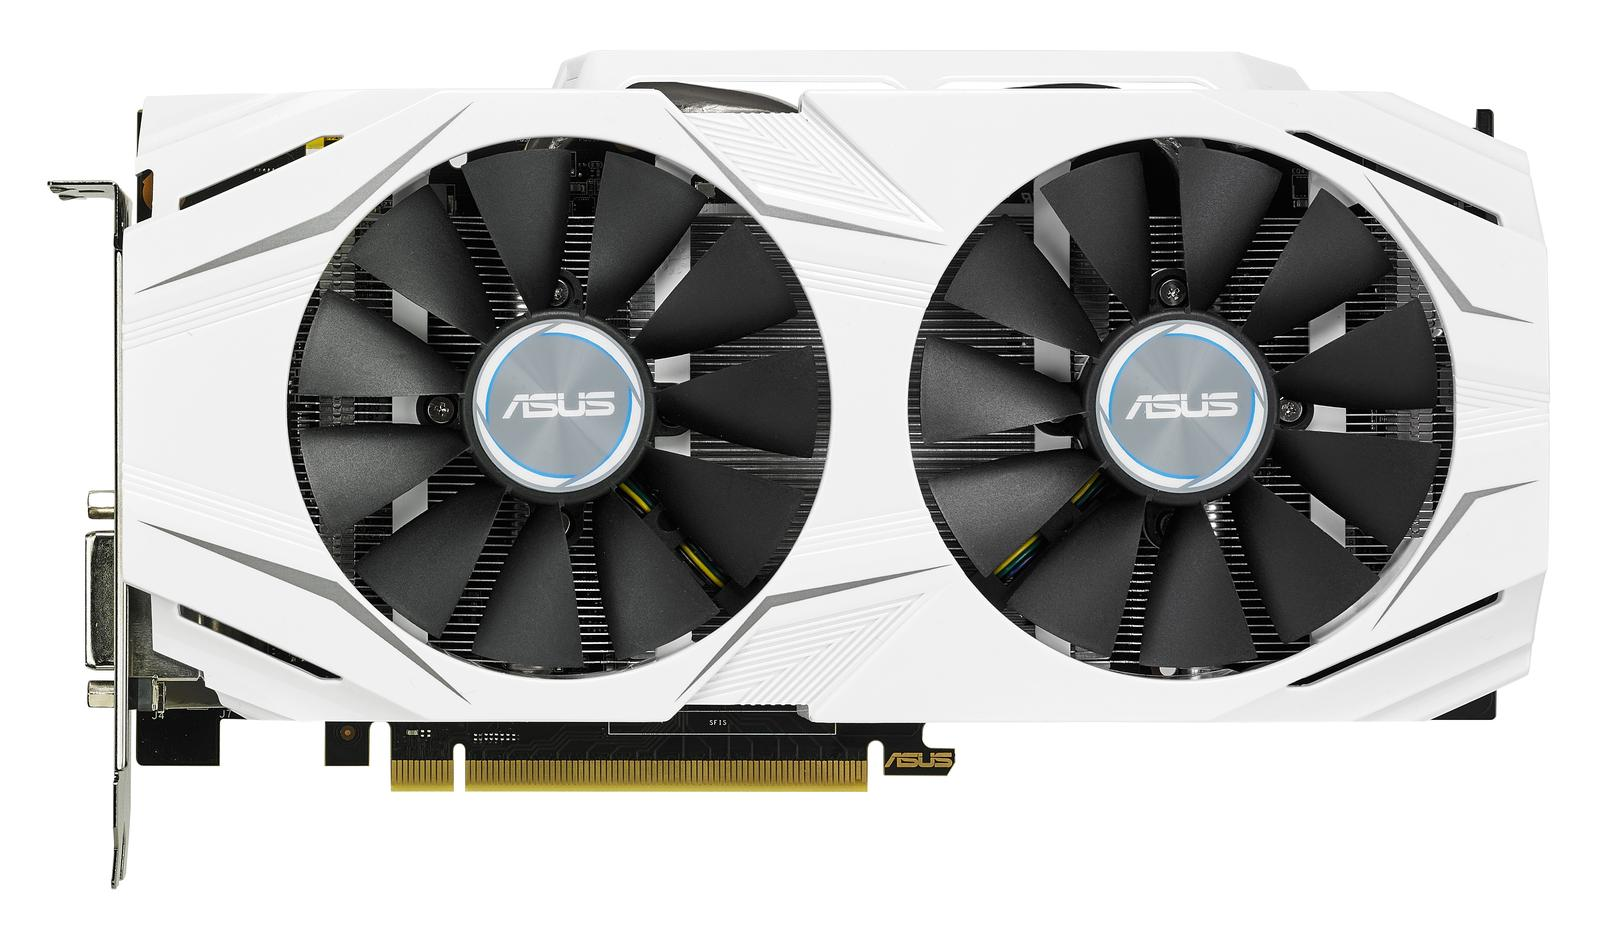 Asus GeForce GTX 1060 6 GB Dual